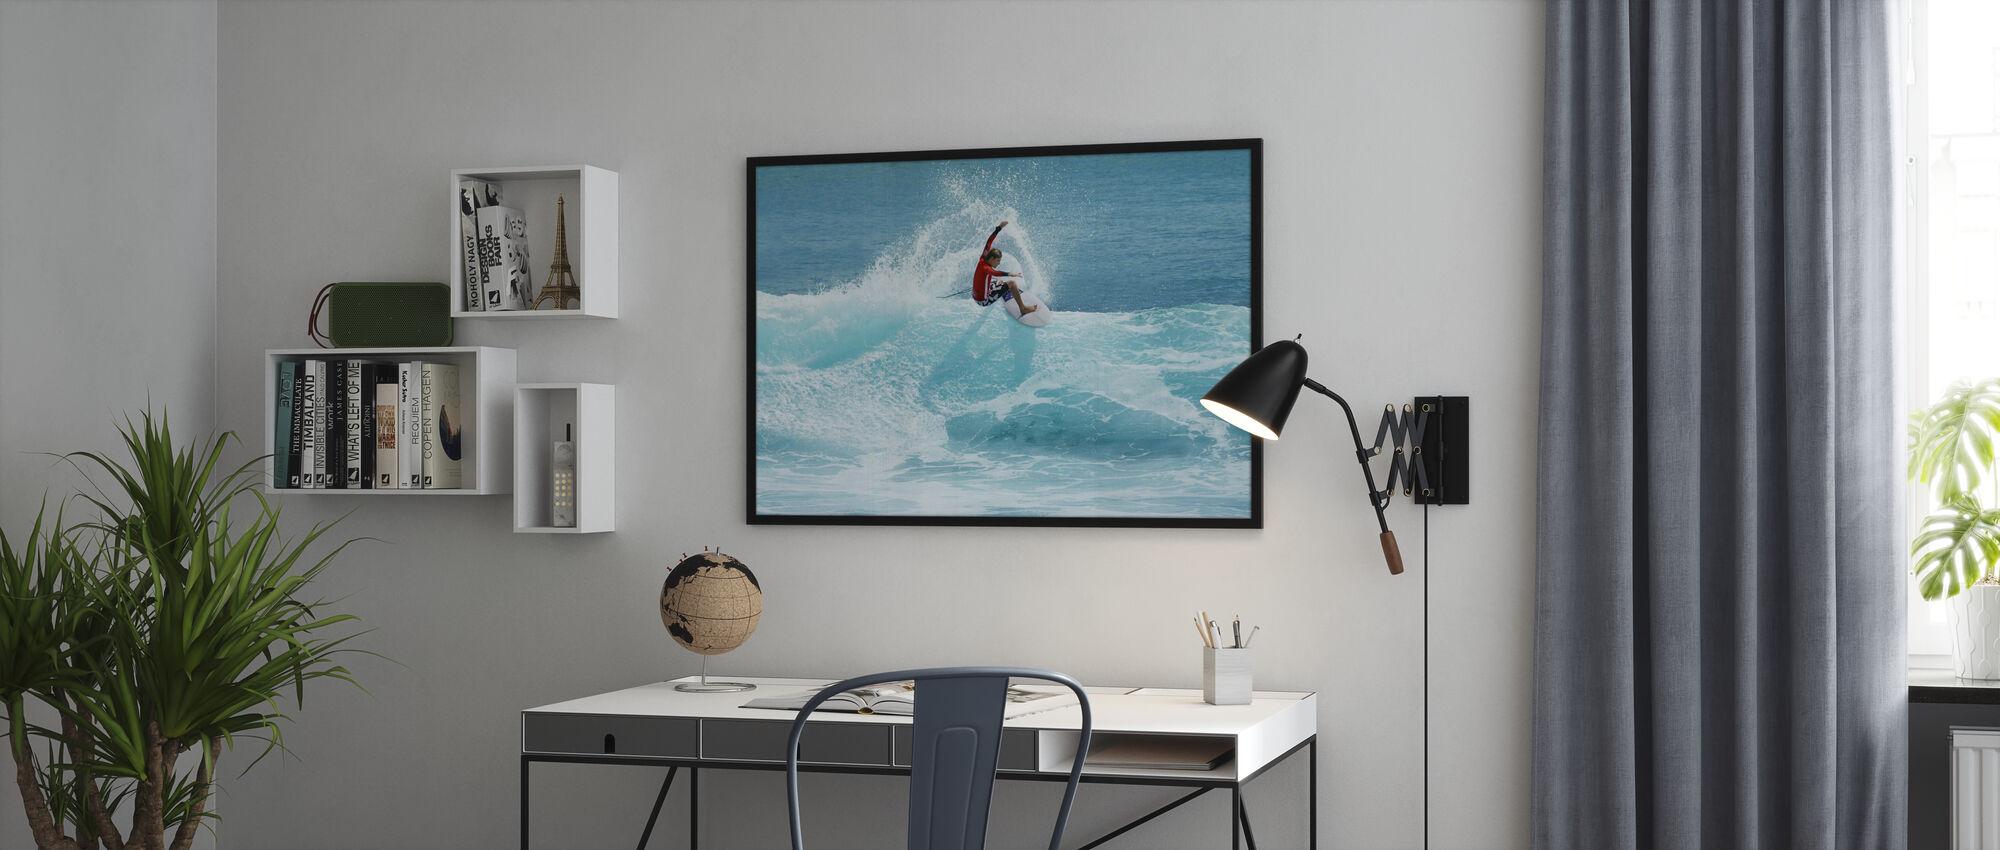 Surfer Carving Top of Wave - Poster - Büro